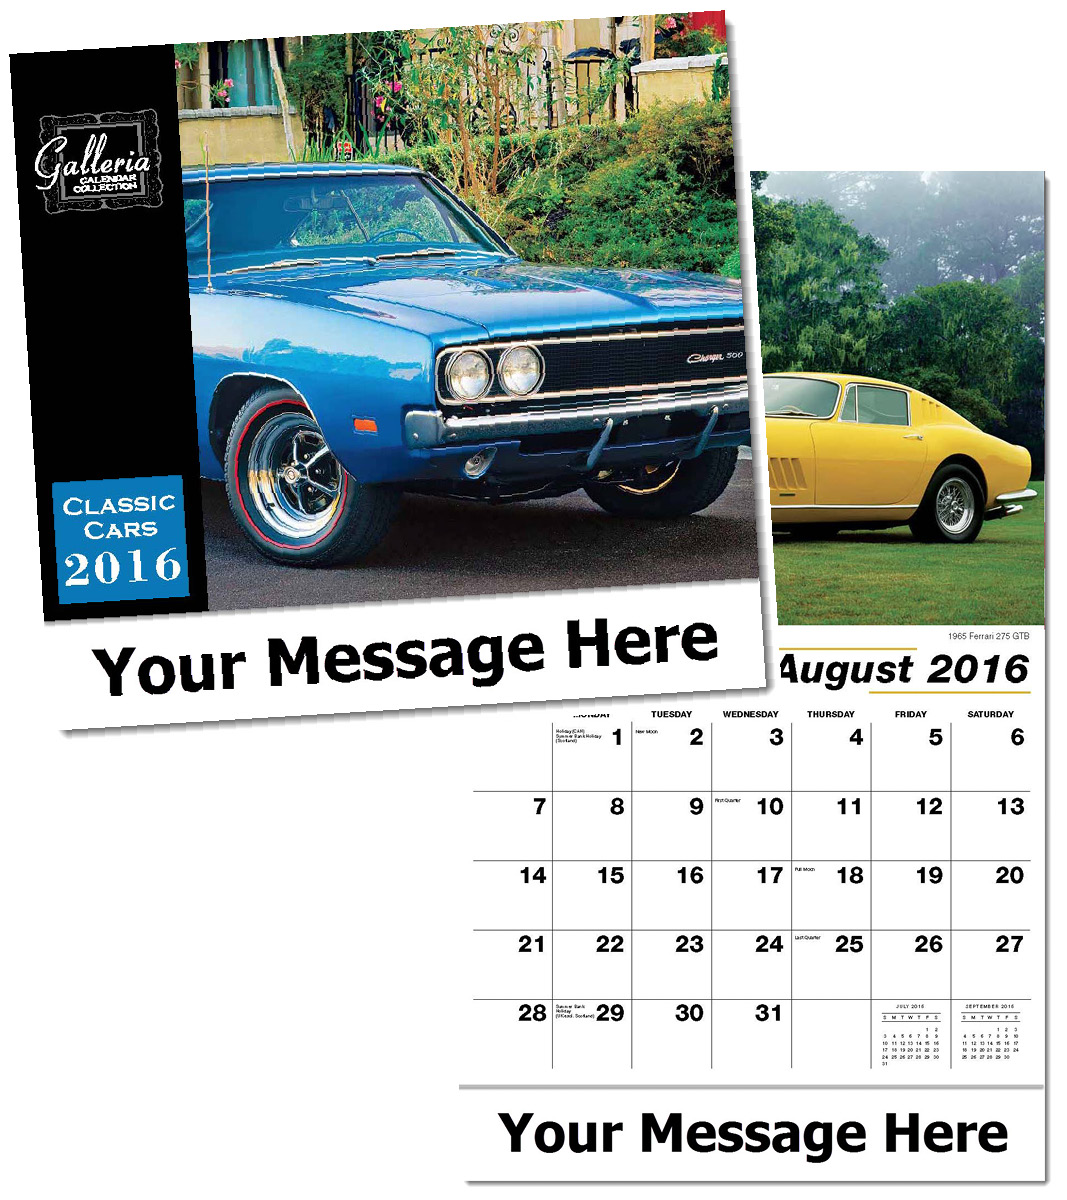 Personalized Classic Cars Calendars Custom Printed in Bulk ...